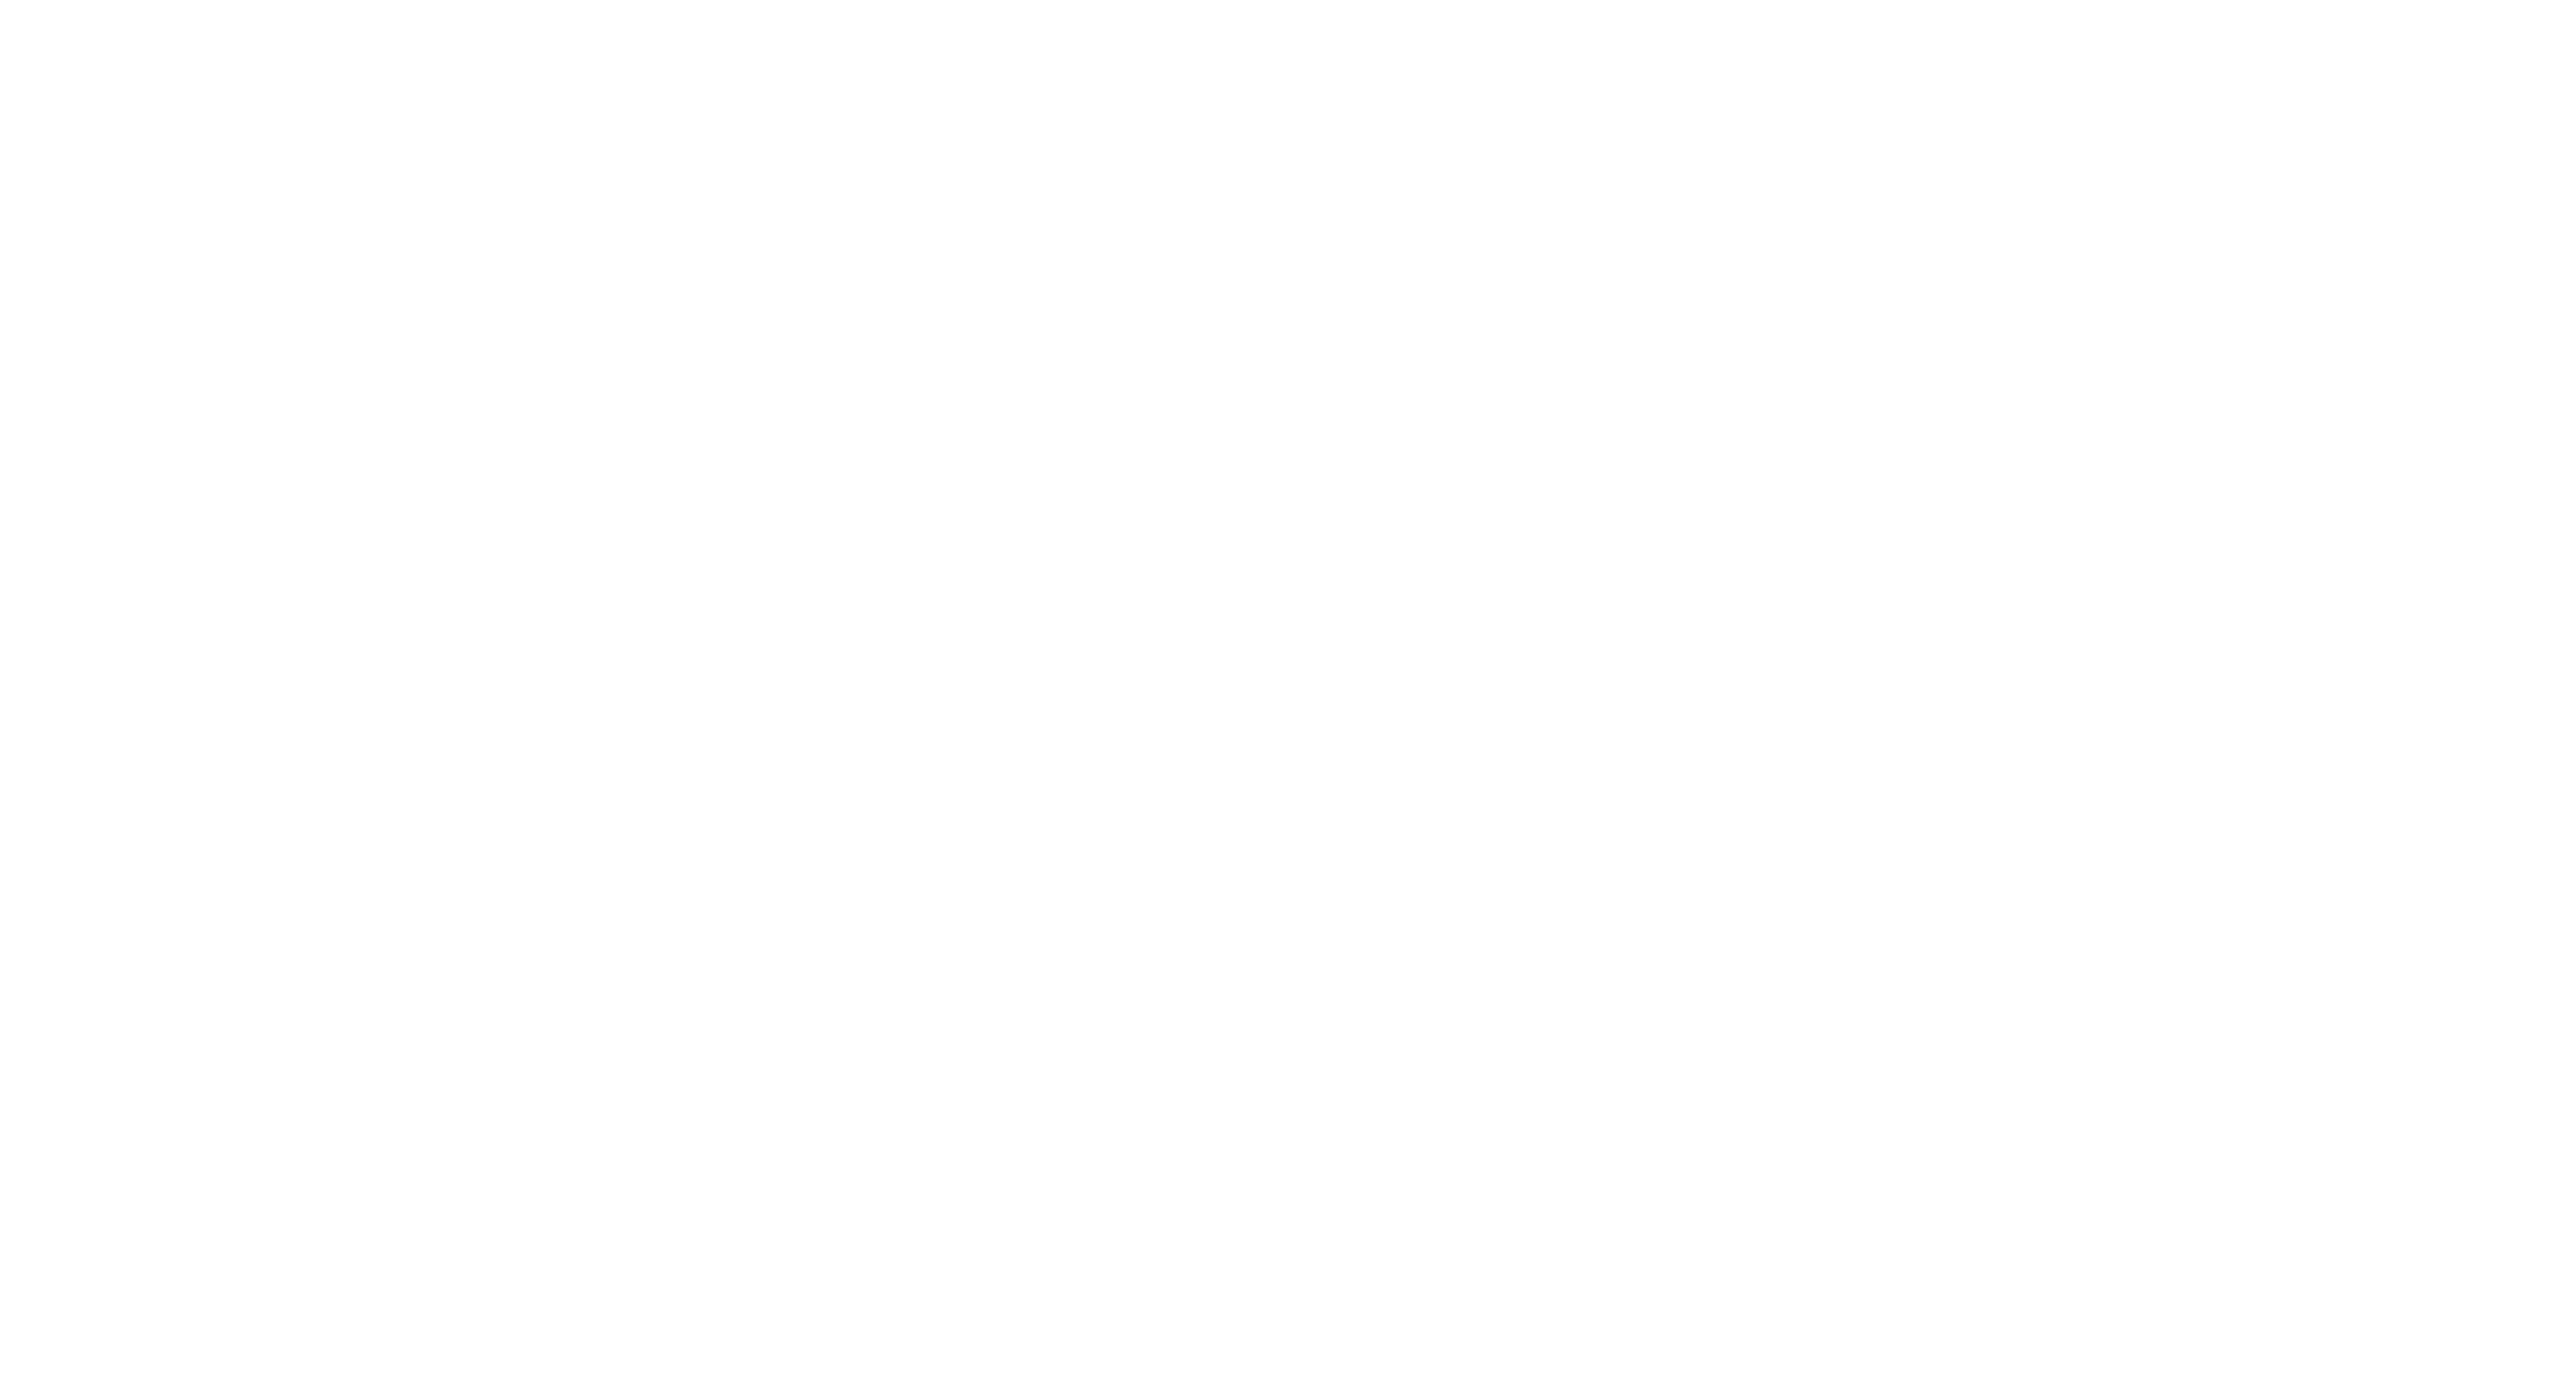 Cloud PNG Image.